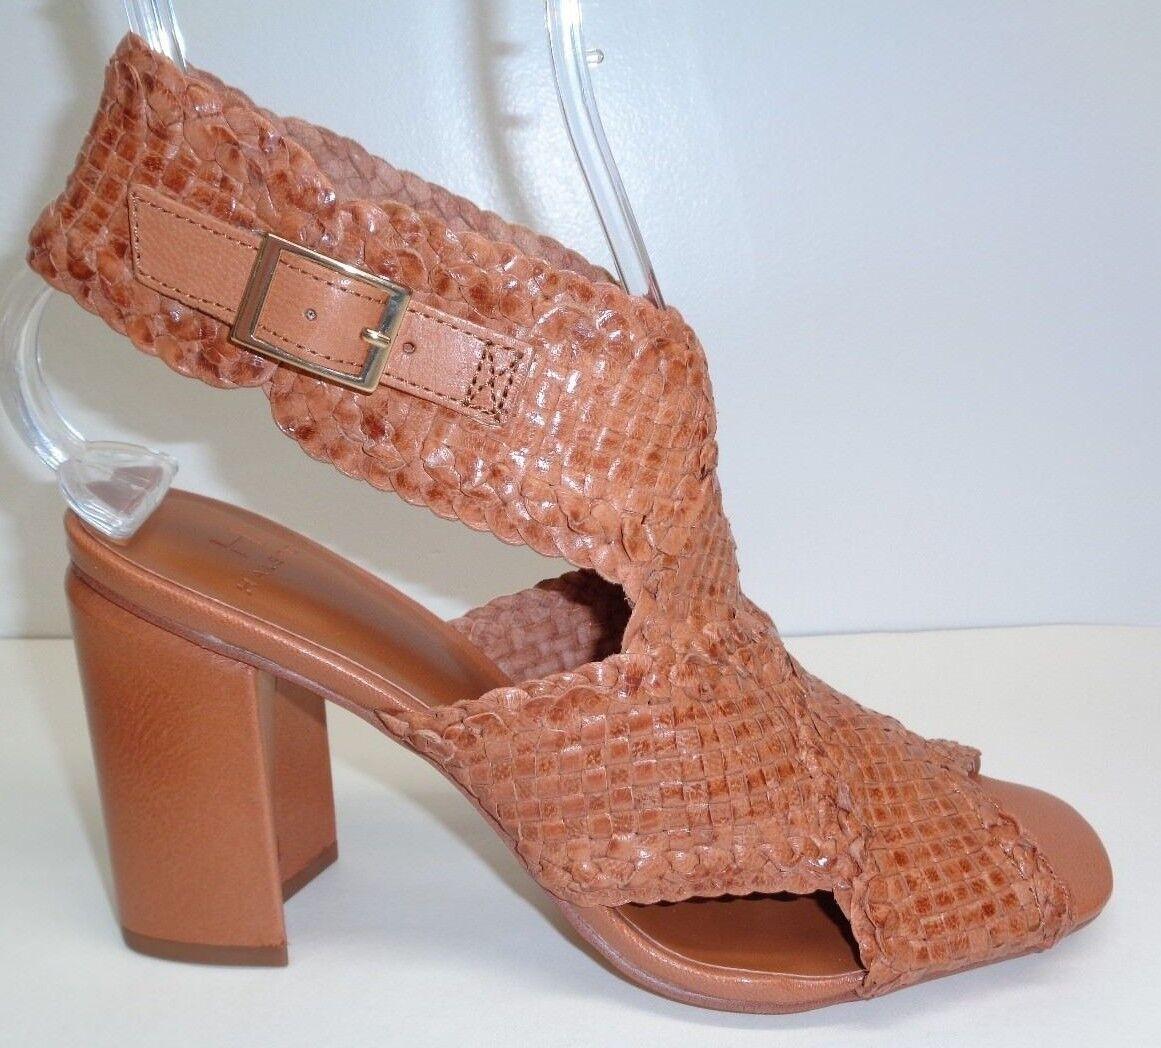 H Halston Größe 9.5 M PENELOPE Braun Woven Leder Heels Sandales NEU Damenschuhe Schuhes